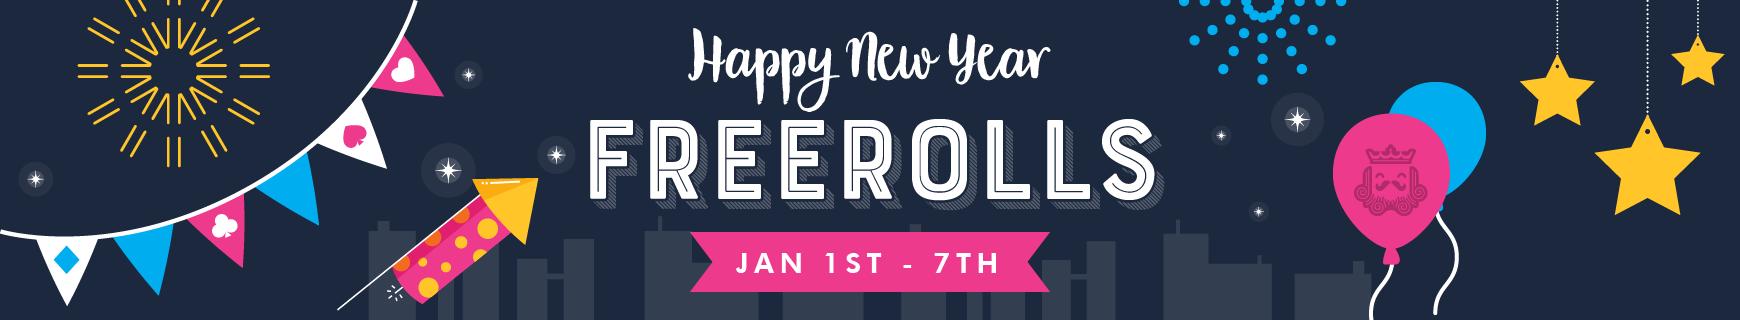 Happy new year freerolls %28870 x 160%29 2x